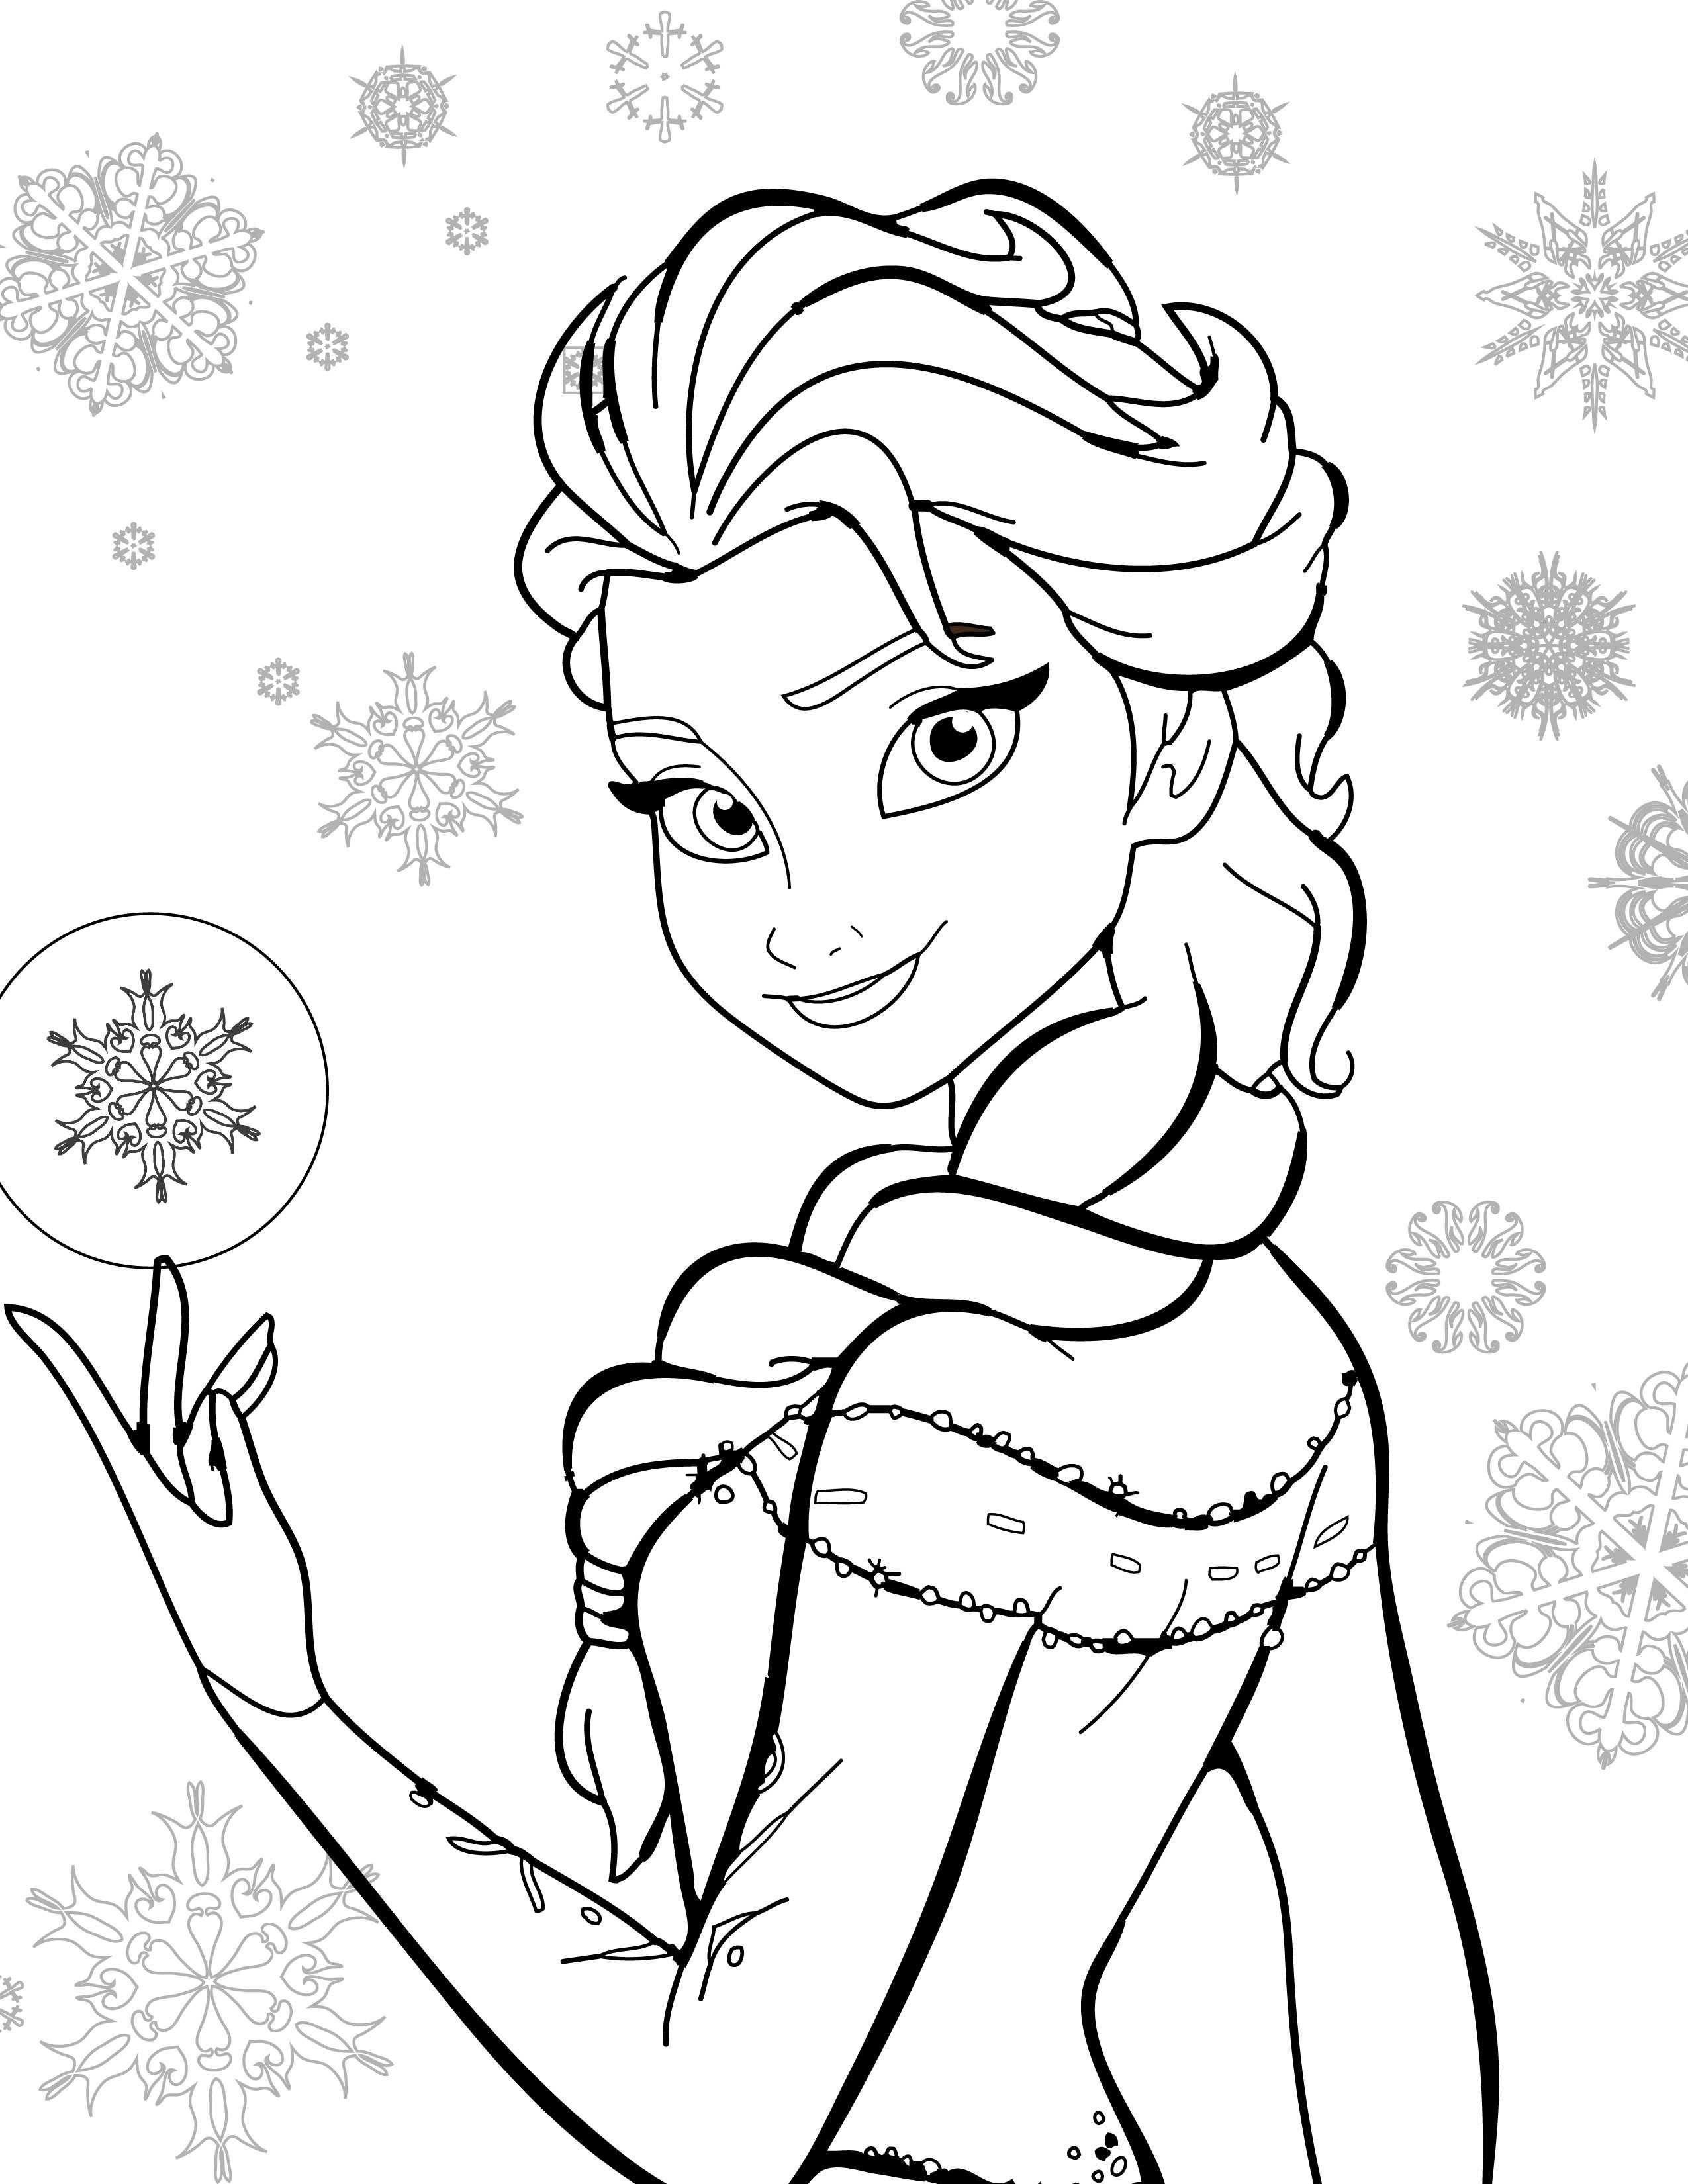 Coloriage De Disney Gratuit Elsa Frozen Artherapie Frozen Kleurplaten Gratis Kleurplaten Disney Kleurplaten